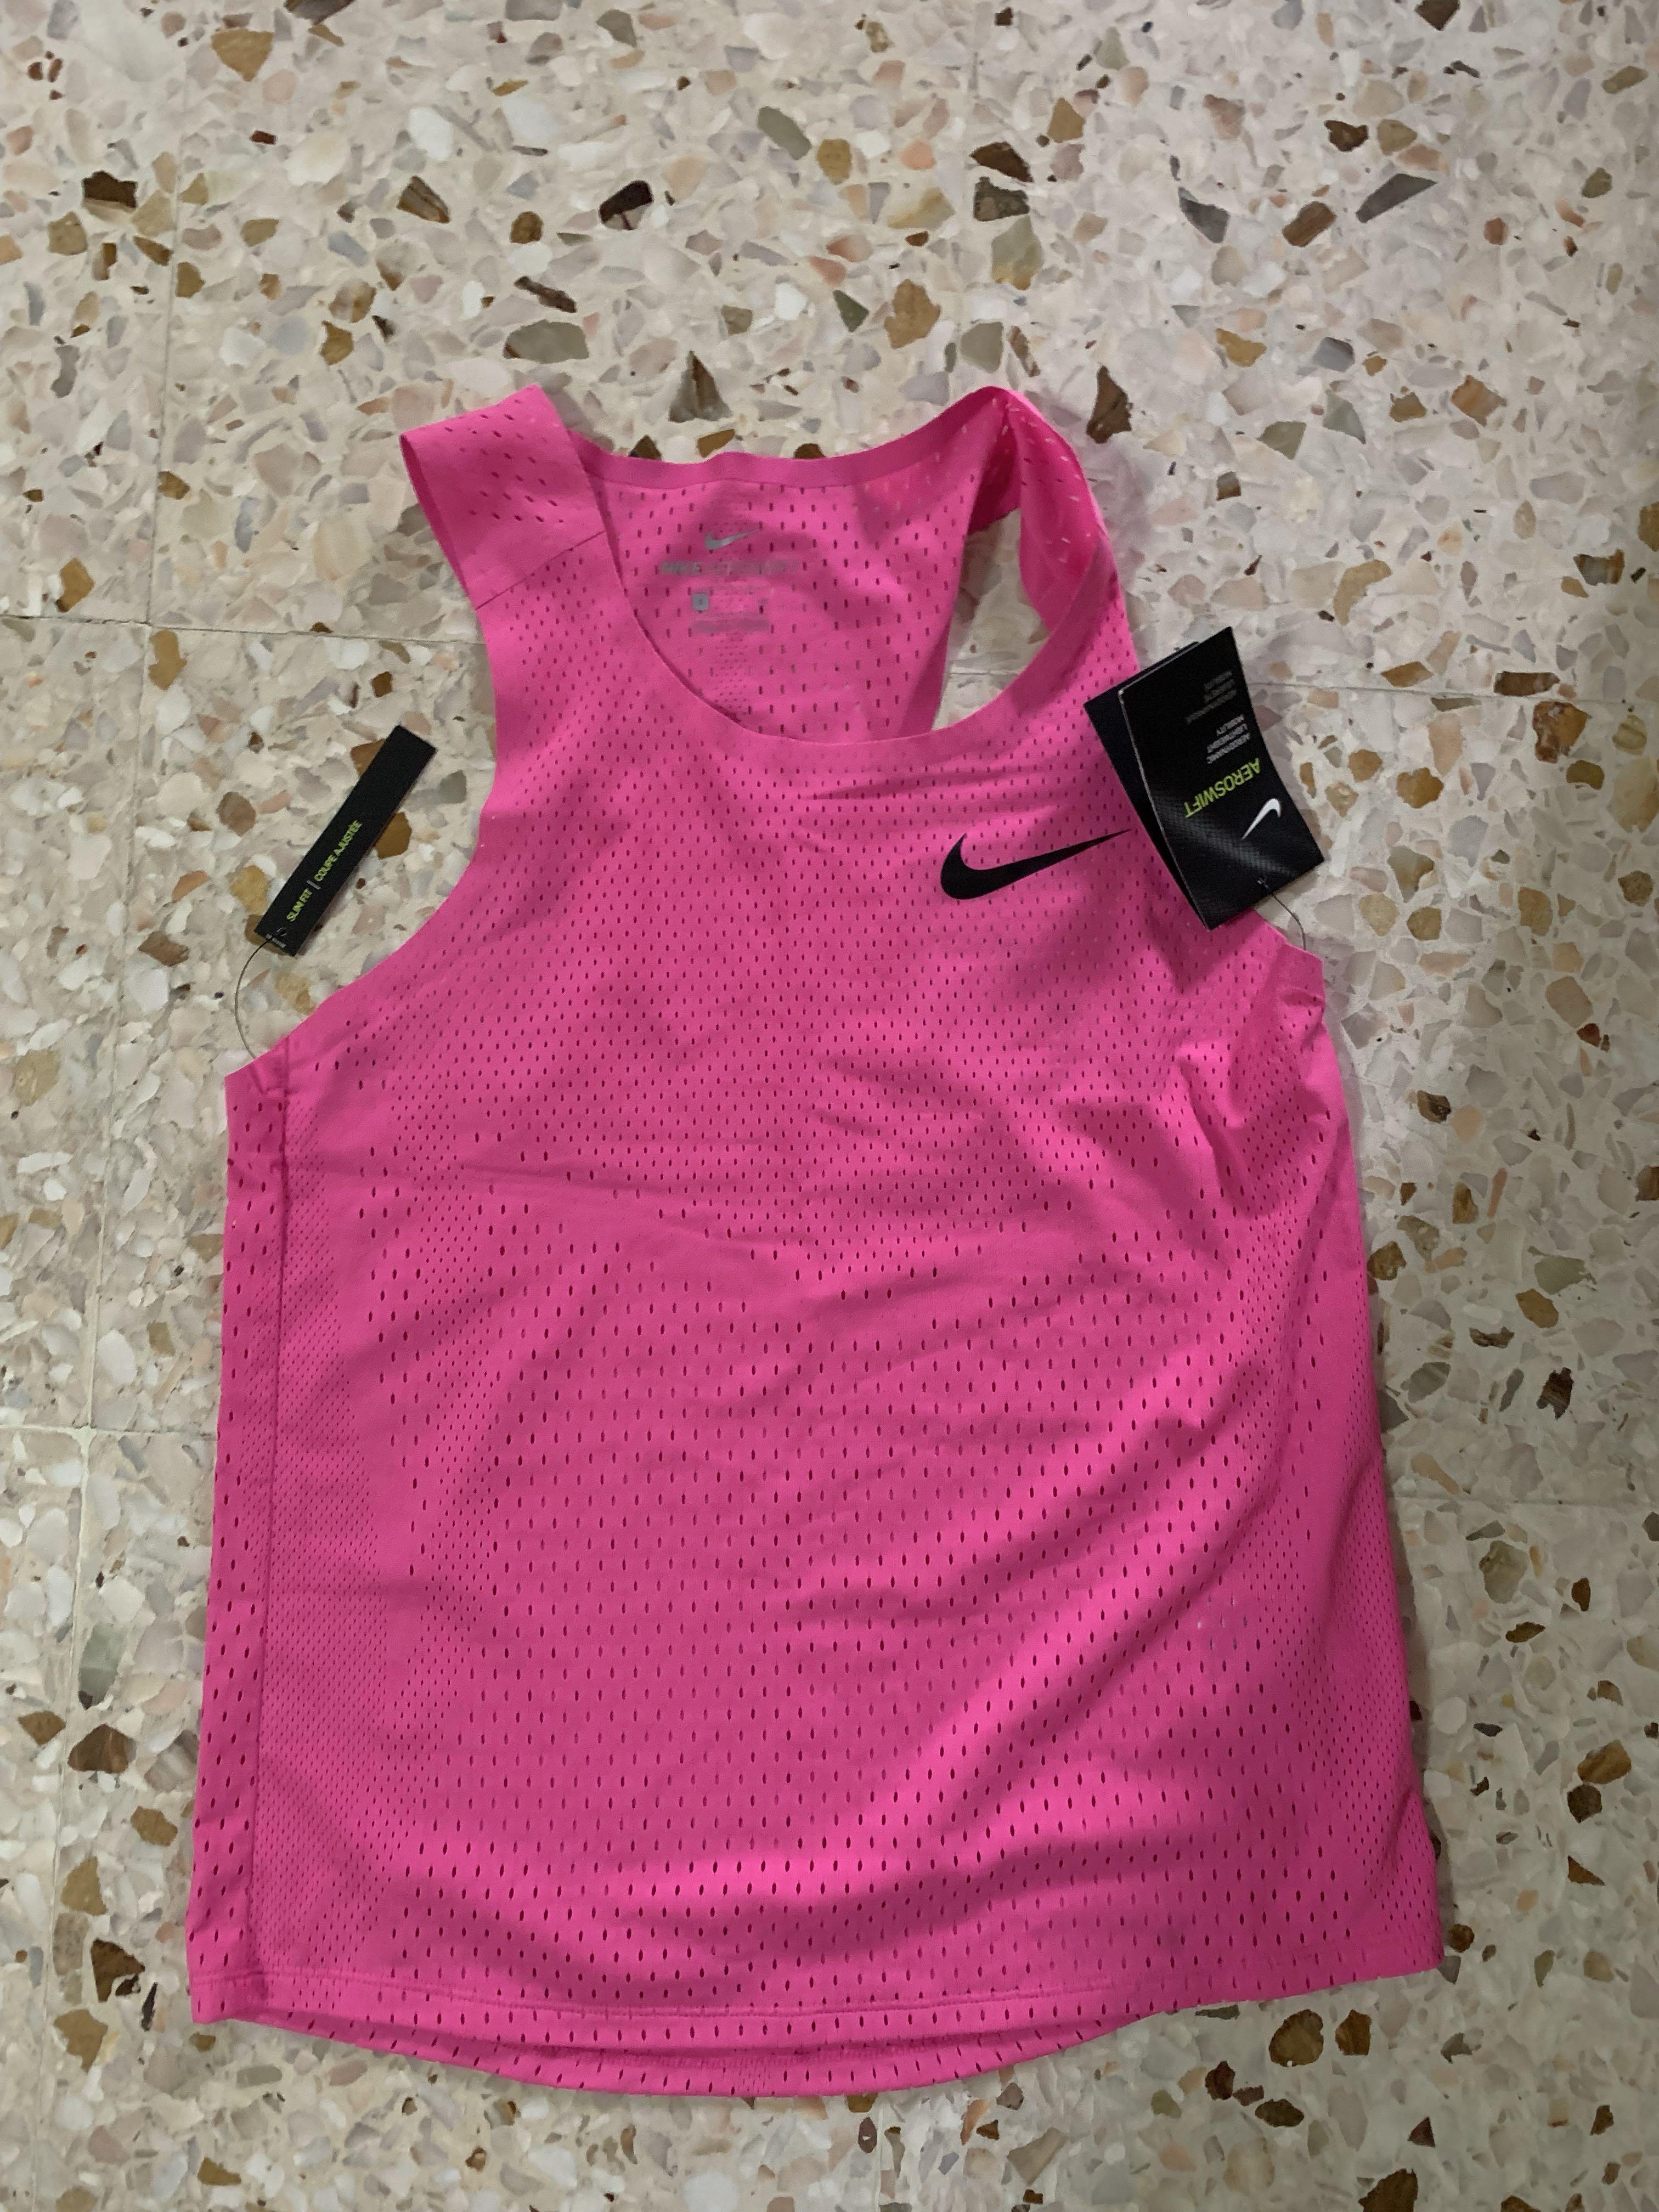 fuga de la prisión contar Ausencia  Nike aeroswift singlet pink Small men's, Sports, Sports Apparel on Carousell